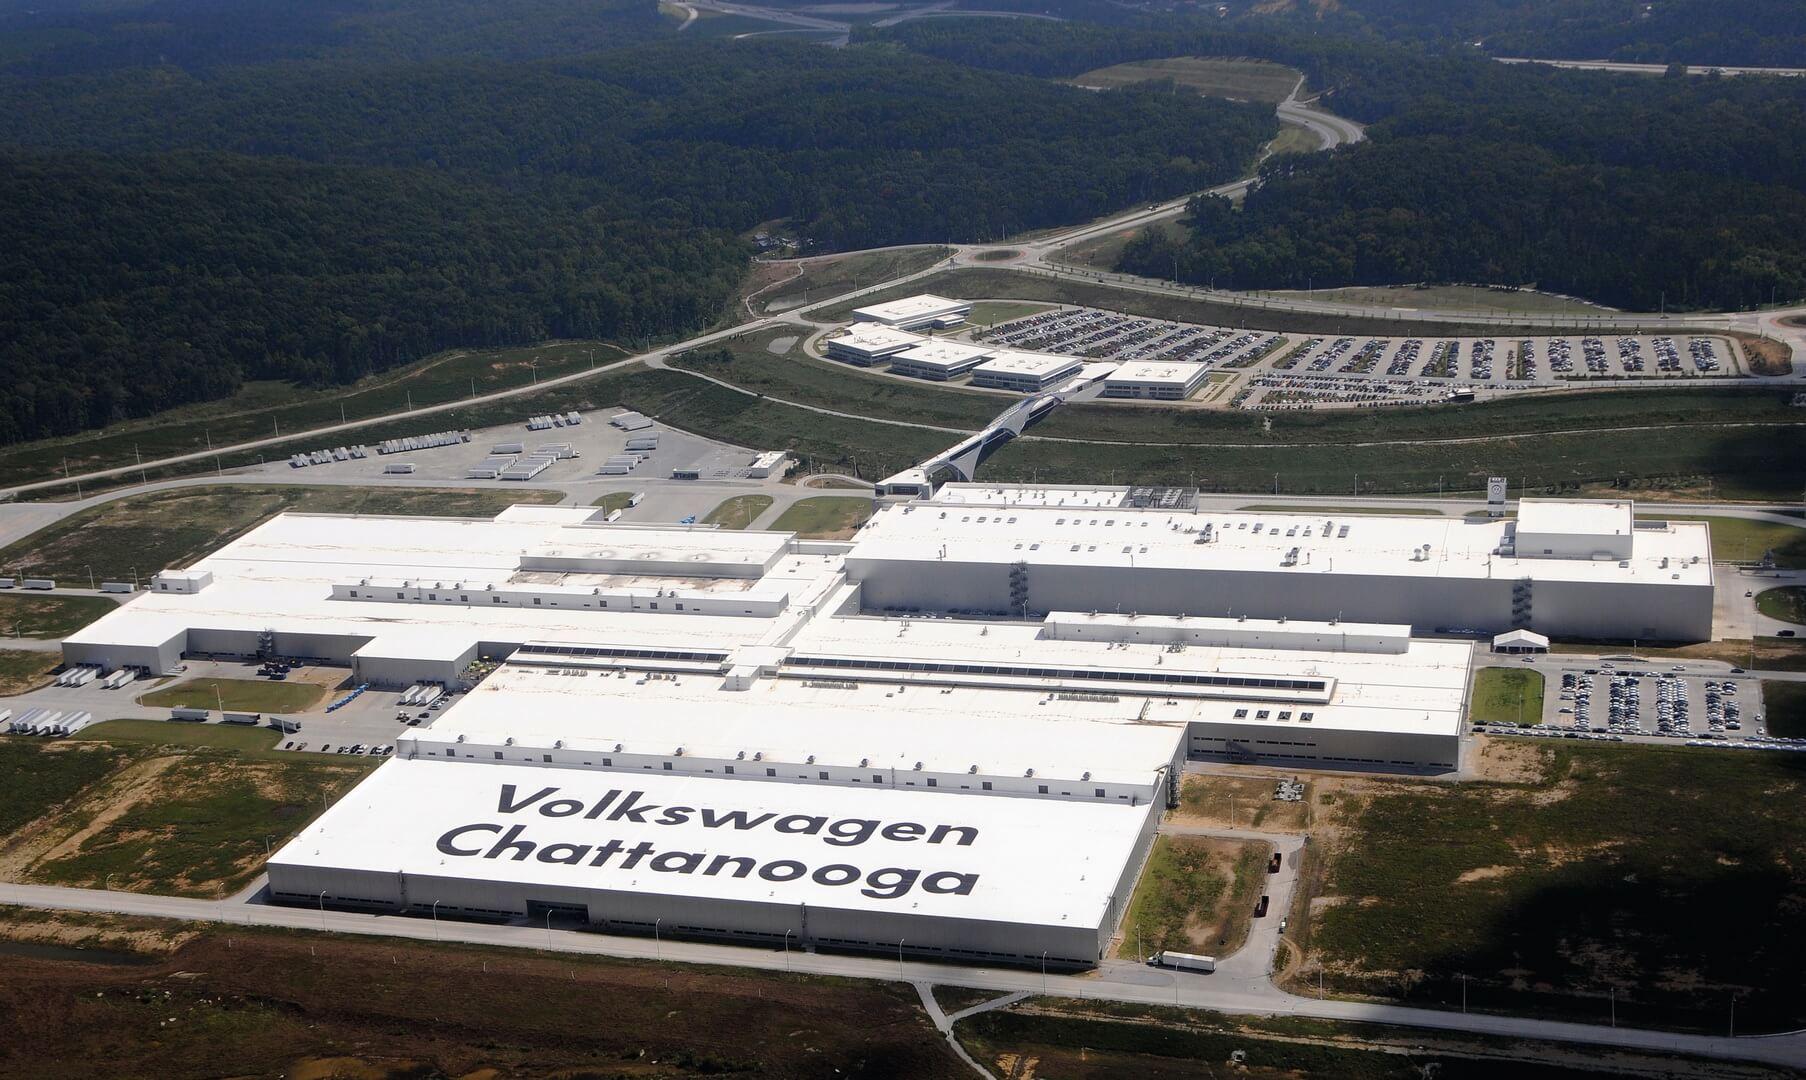 Завод Volkswagen в Чаттануге, штат Теннесси, США